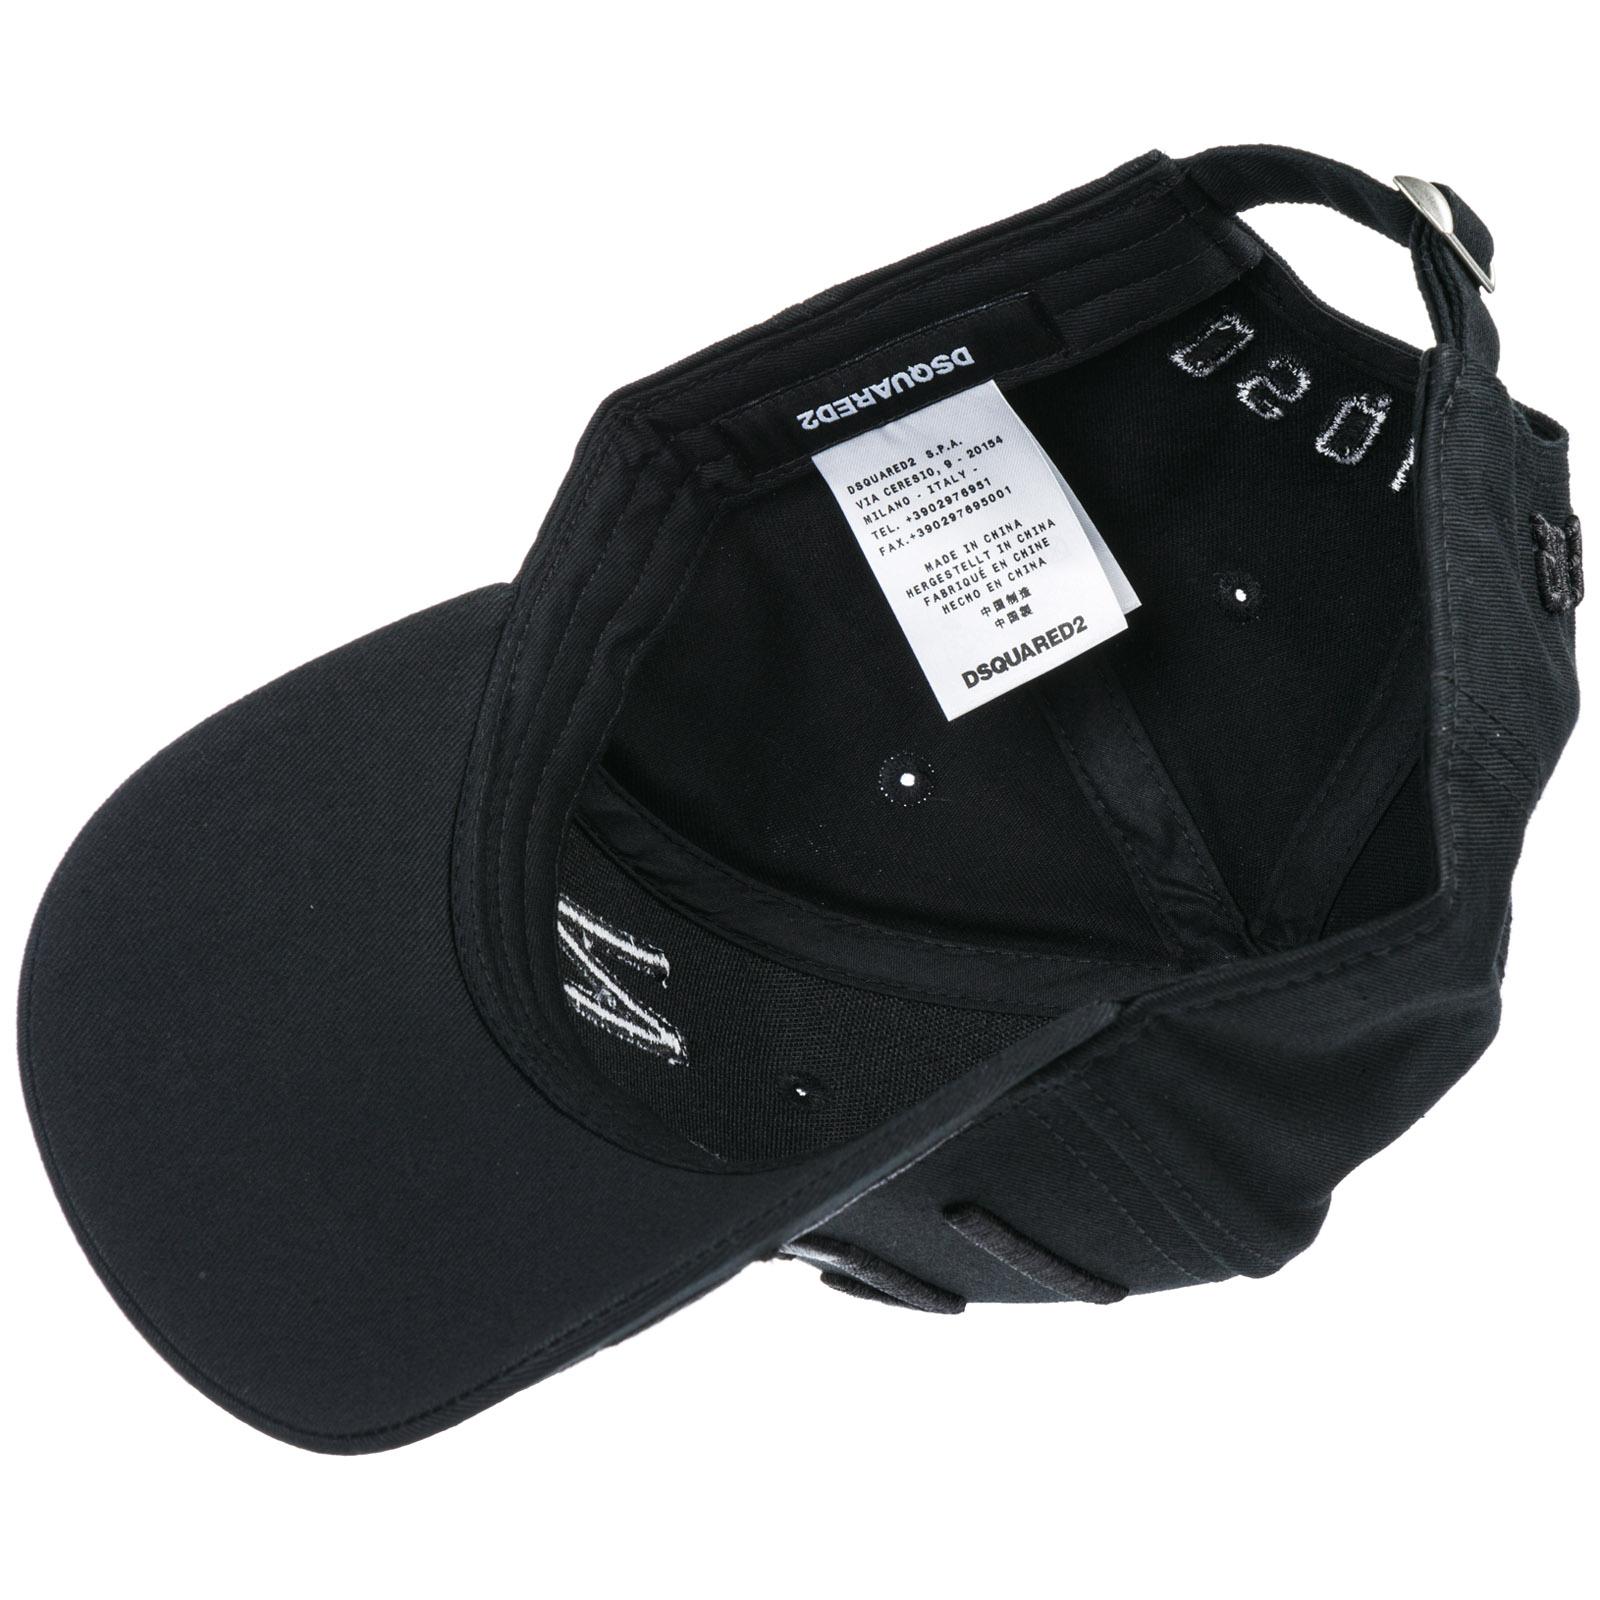 Adjustable men's cotton hat baseball cap  icon